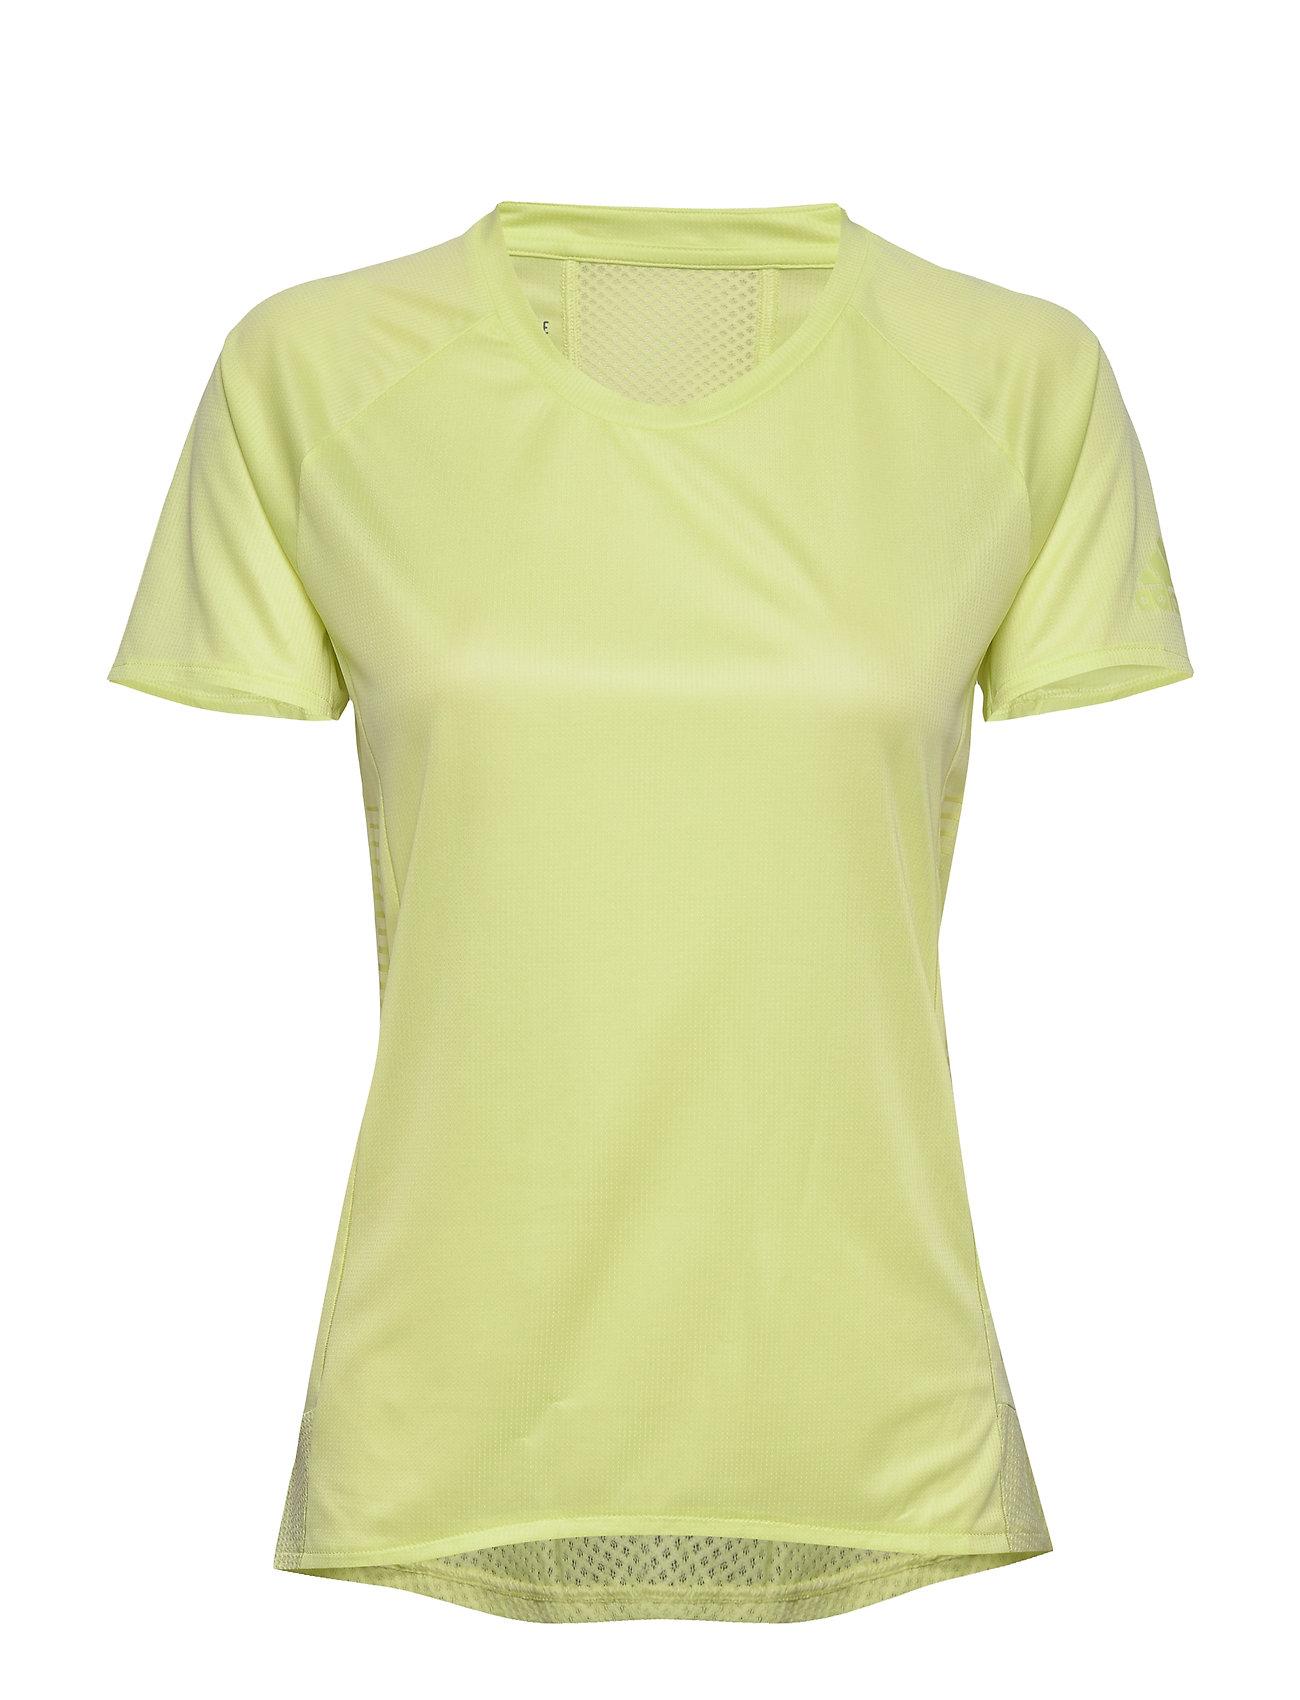 Image of 25/7 Tee Women T-shirt Top Adidas Performance (3406255443)